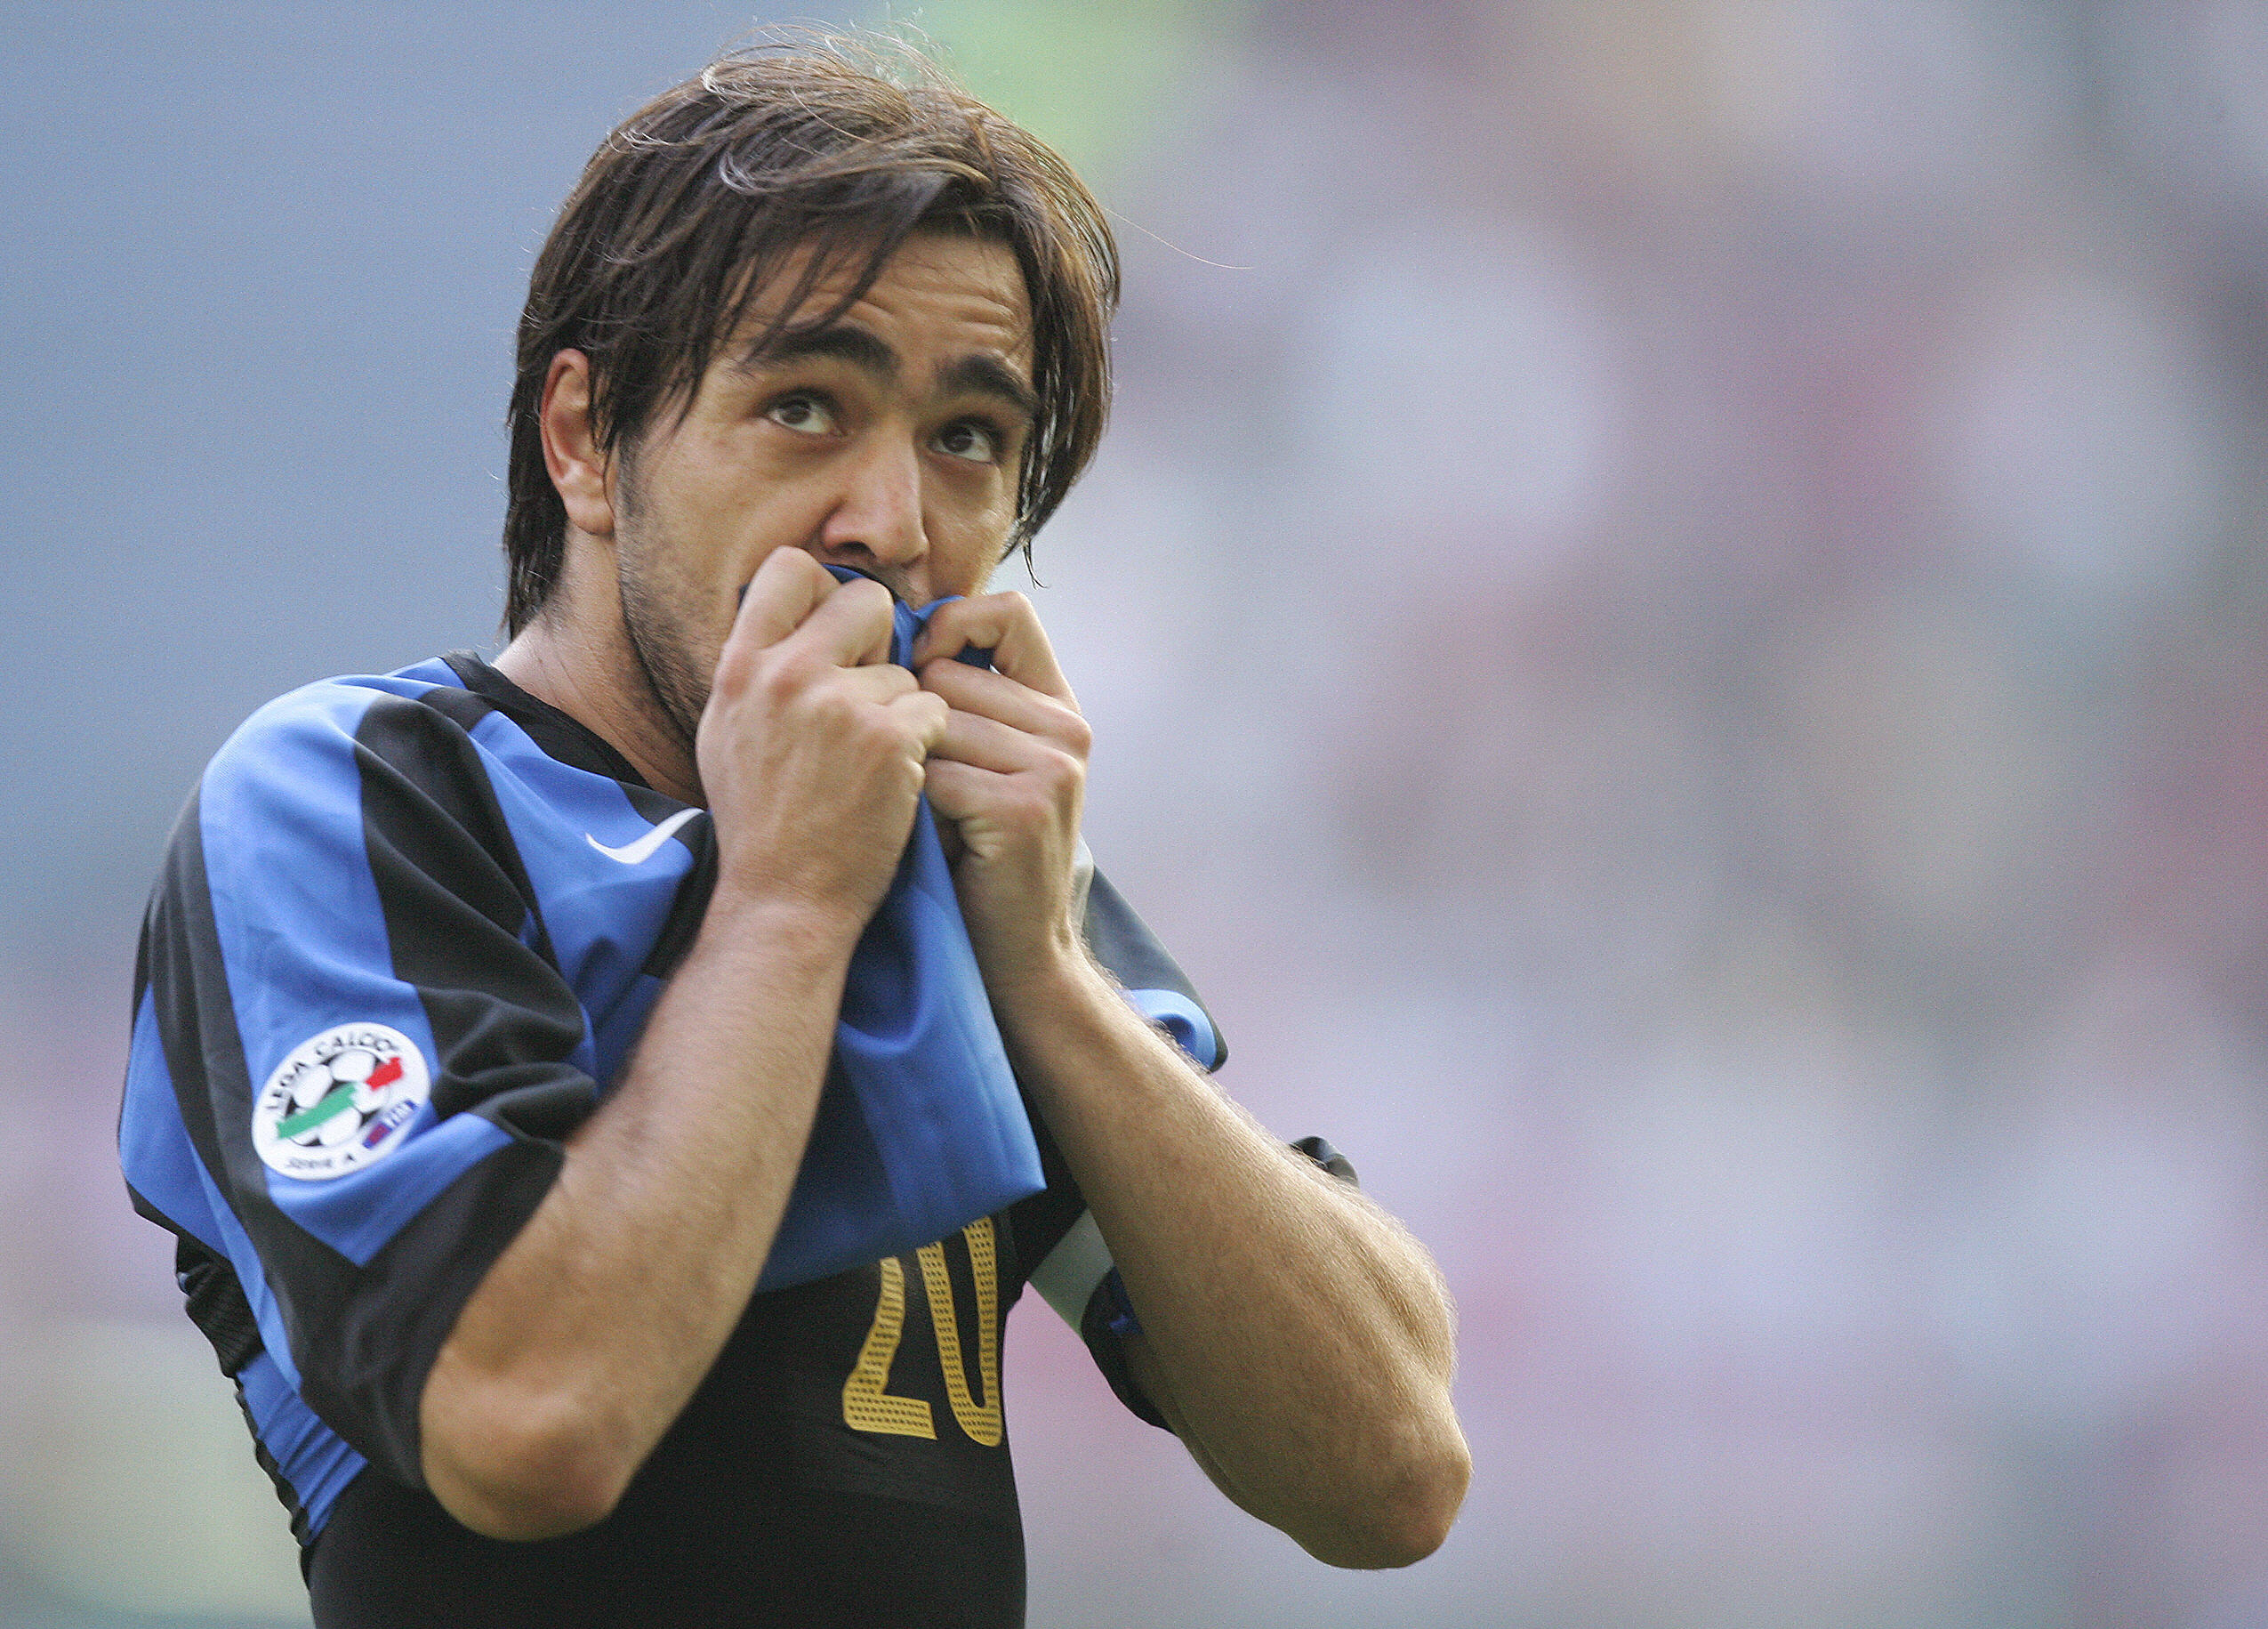 Inter Milan's forward Alvaro Recoba of U